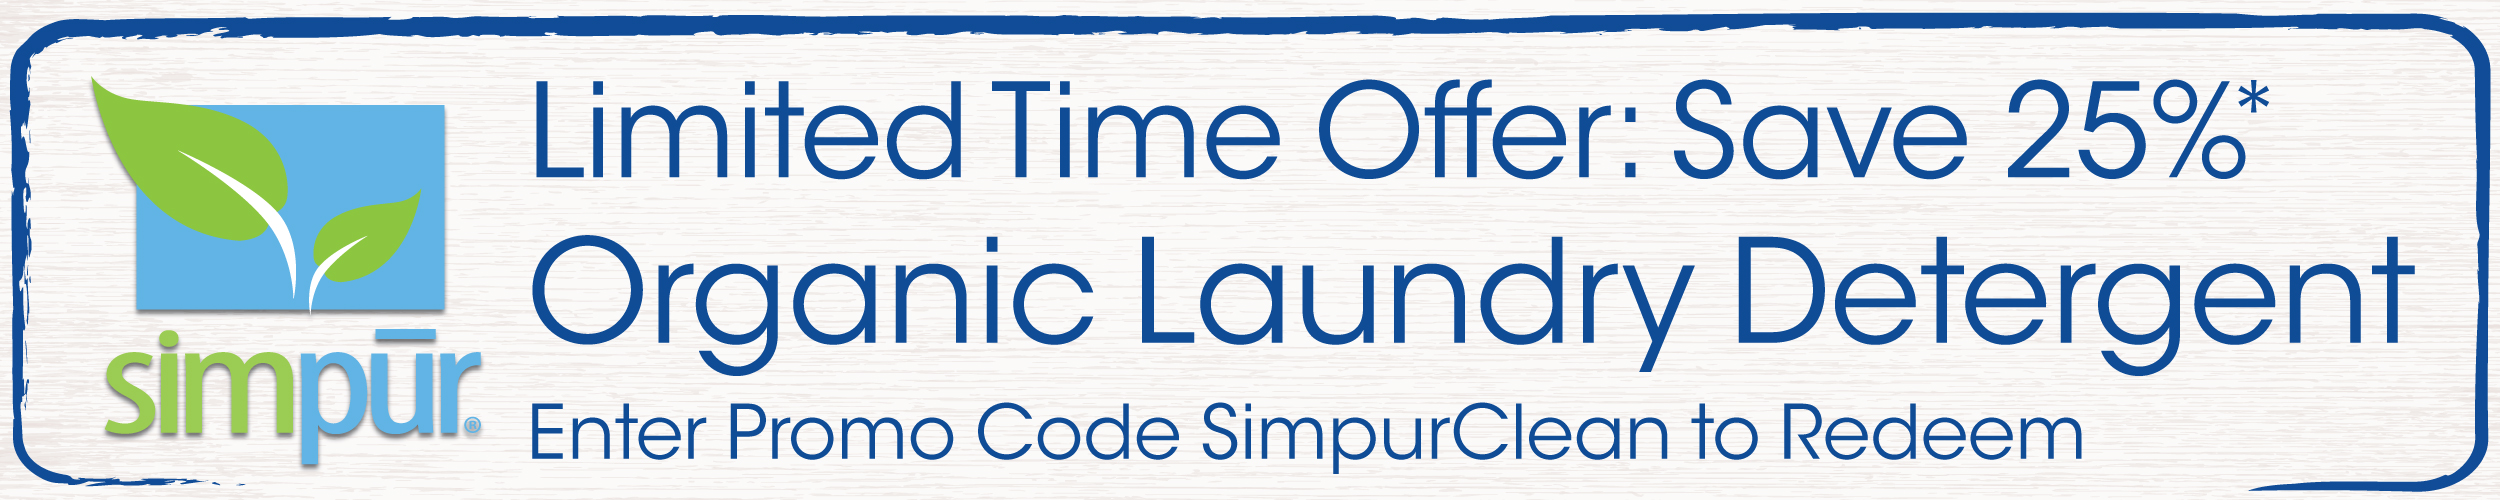 Save 25% on Simpur Organic Laundry Detergent